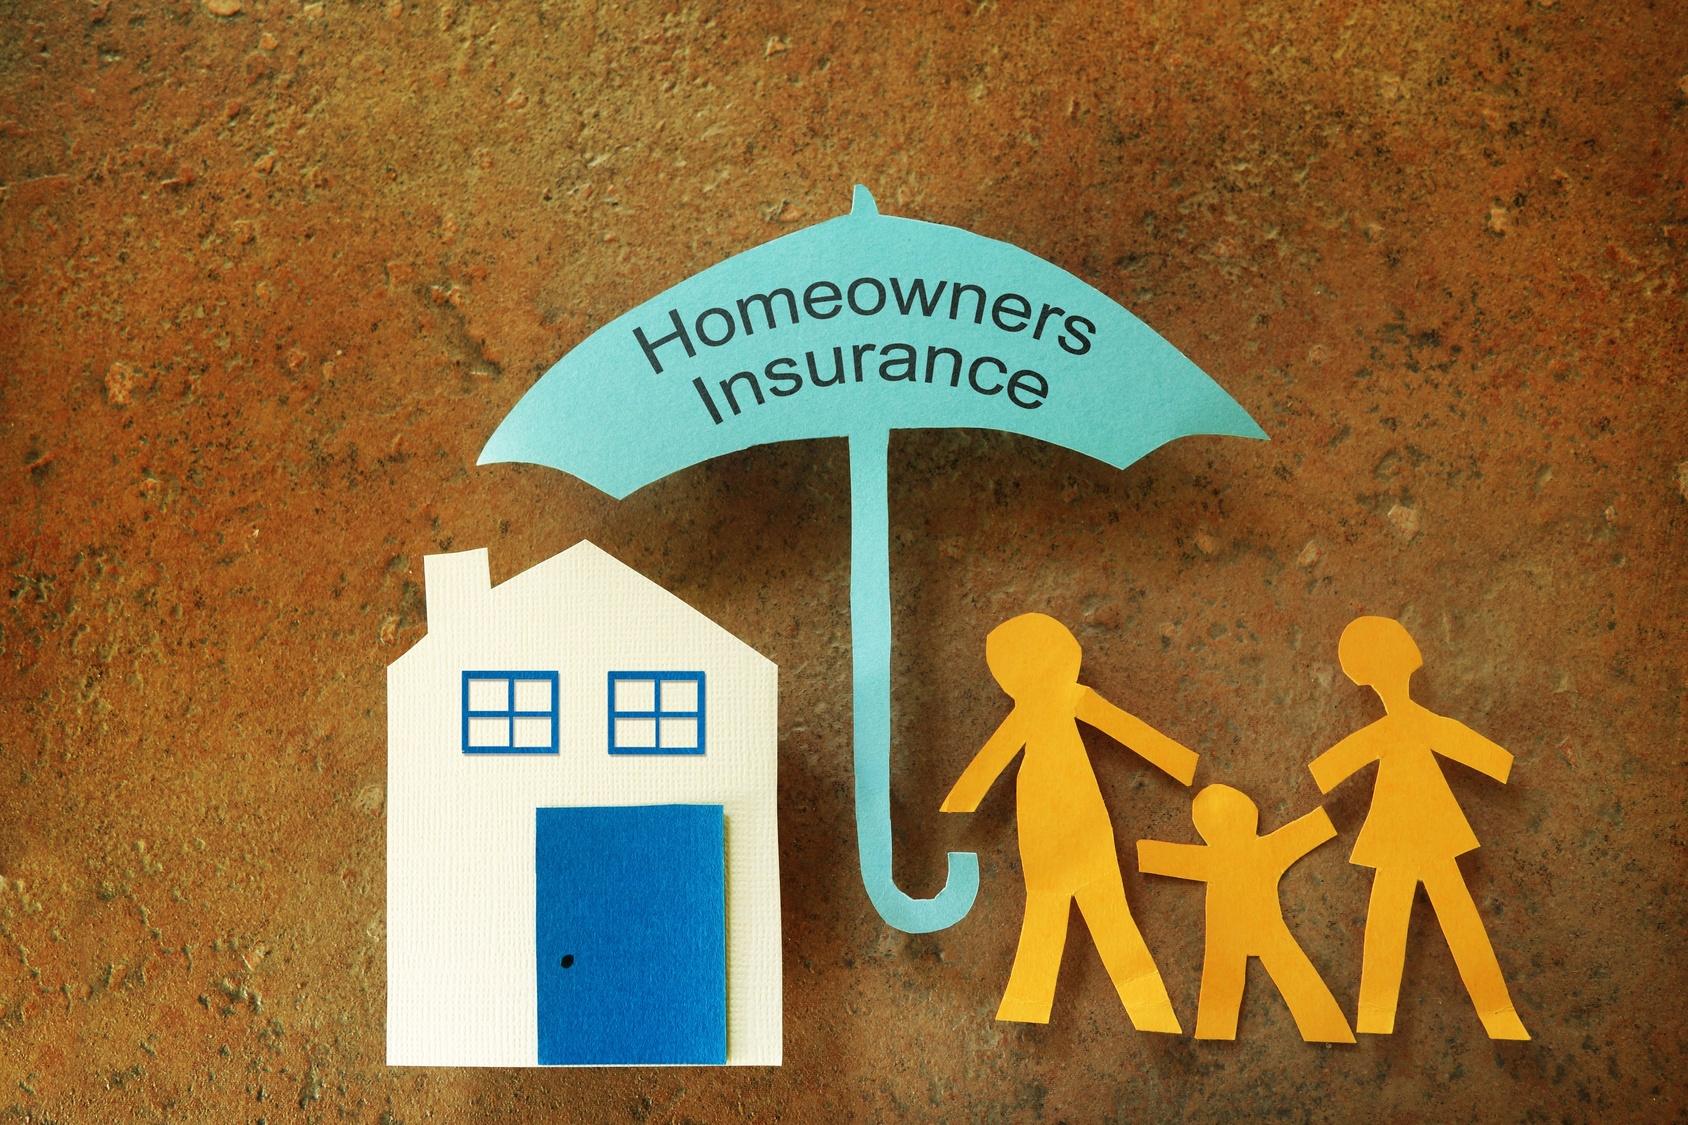 Homeowners Insurance Express.jpg